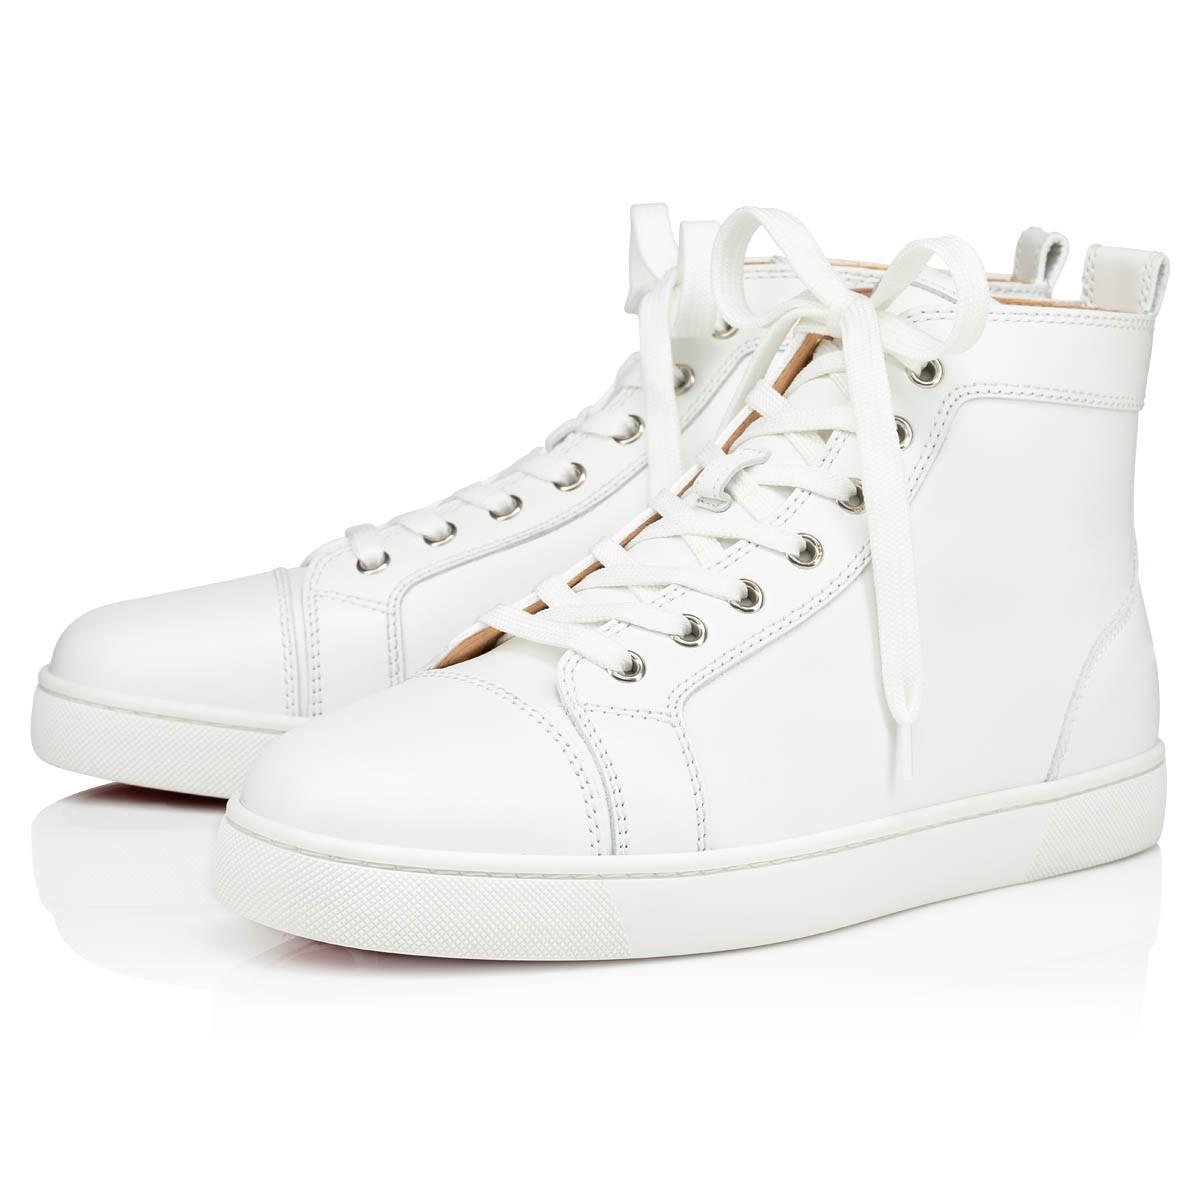 LOUIS WHITE Calf - Men Shoes